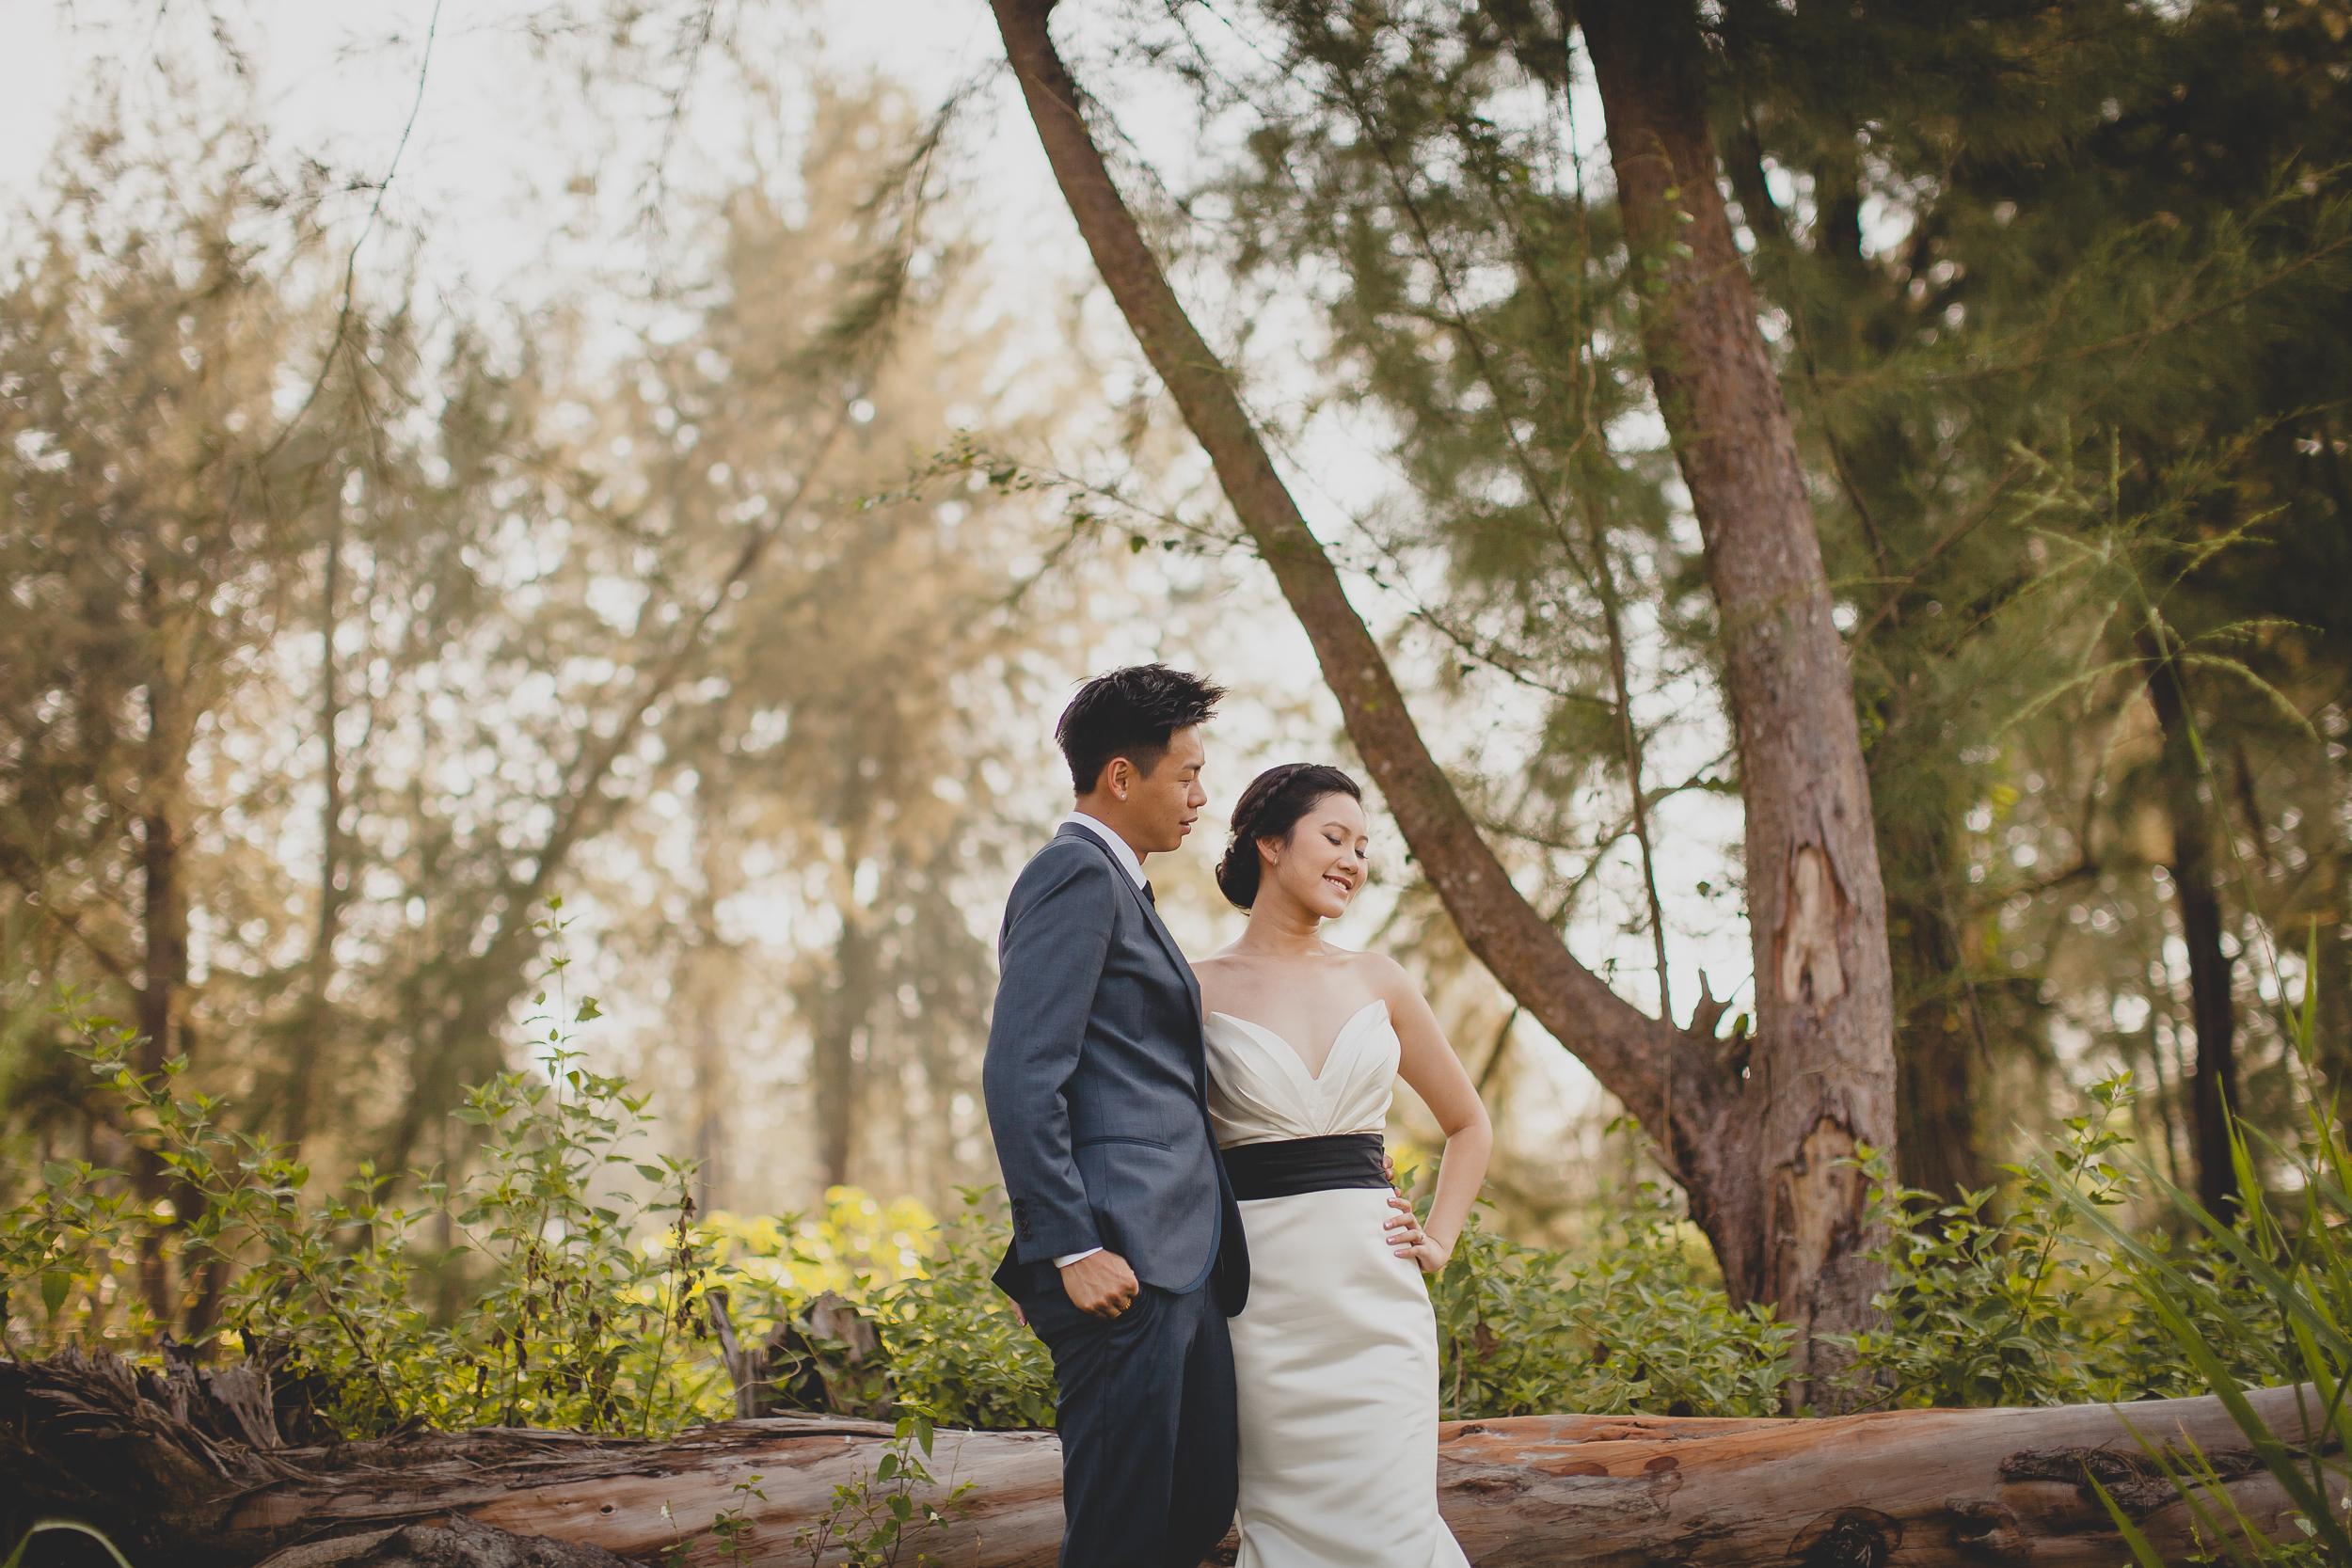 Singapore+Pre+Wedding+Photographer+Ziyang+Clara-0027.jpg